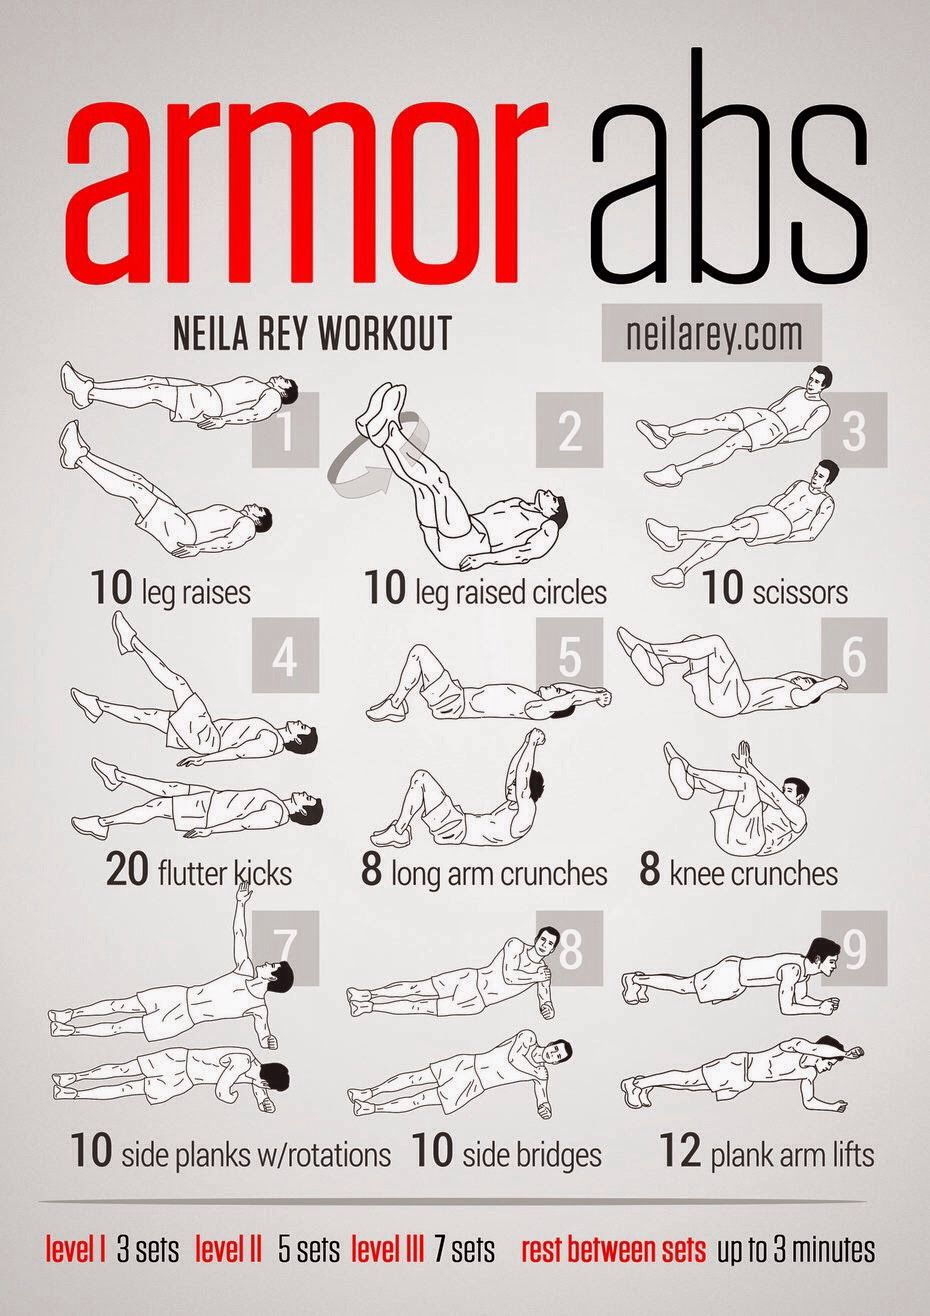 Upper Body Workouts | Fitness | Pinterest | Upper body workouts ...